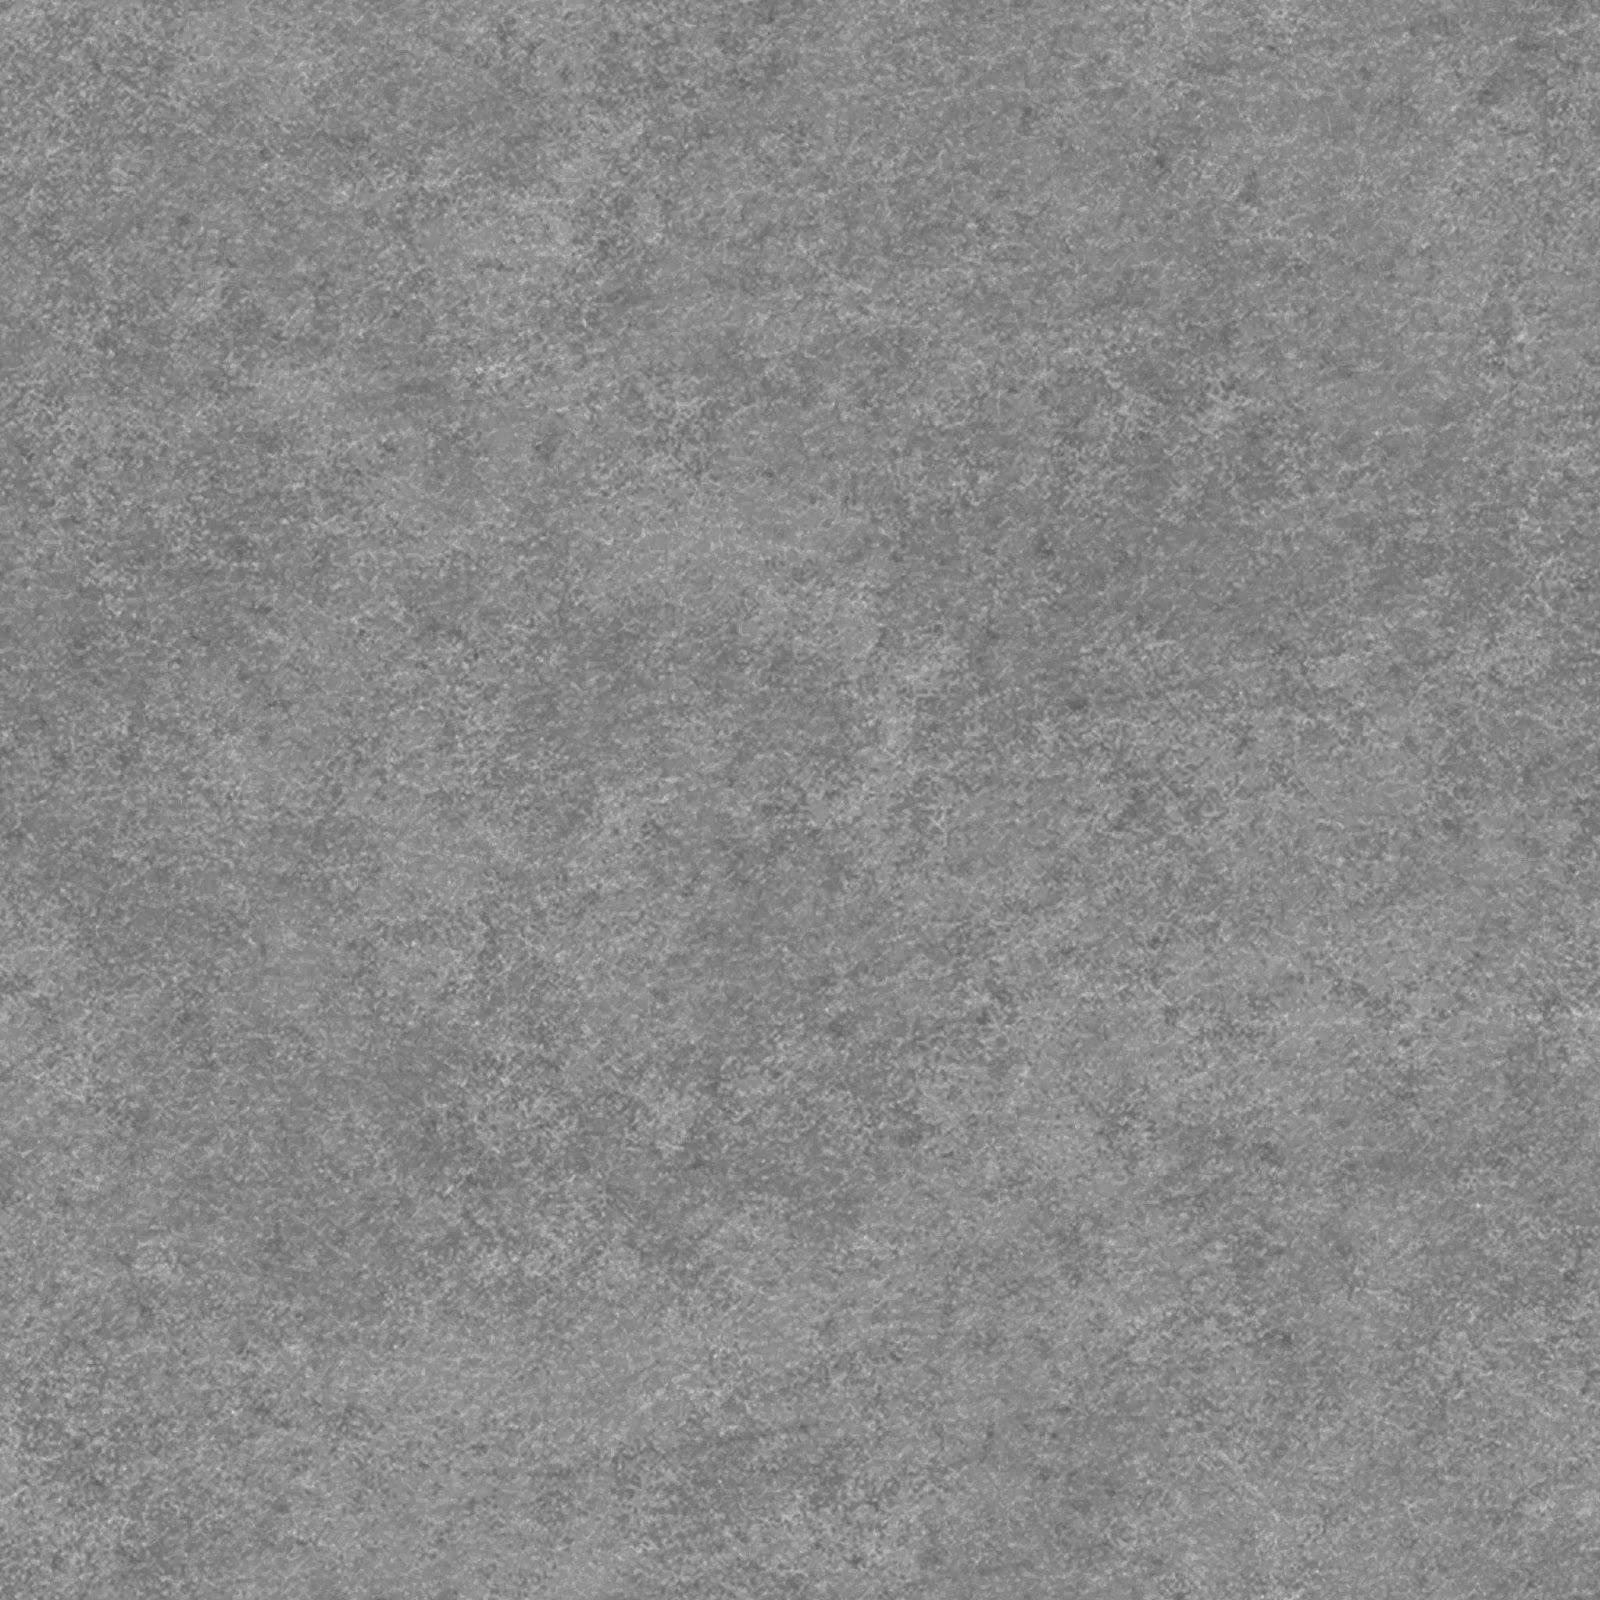 High Resolution Seamless Textures Free Seamless Metal